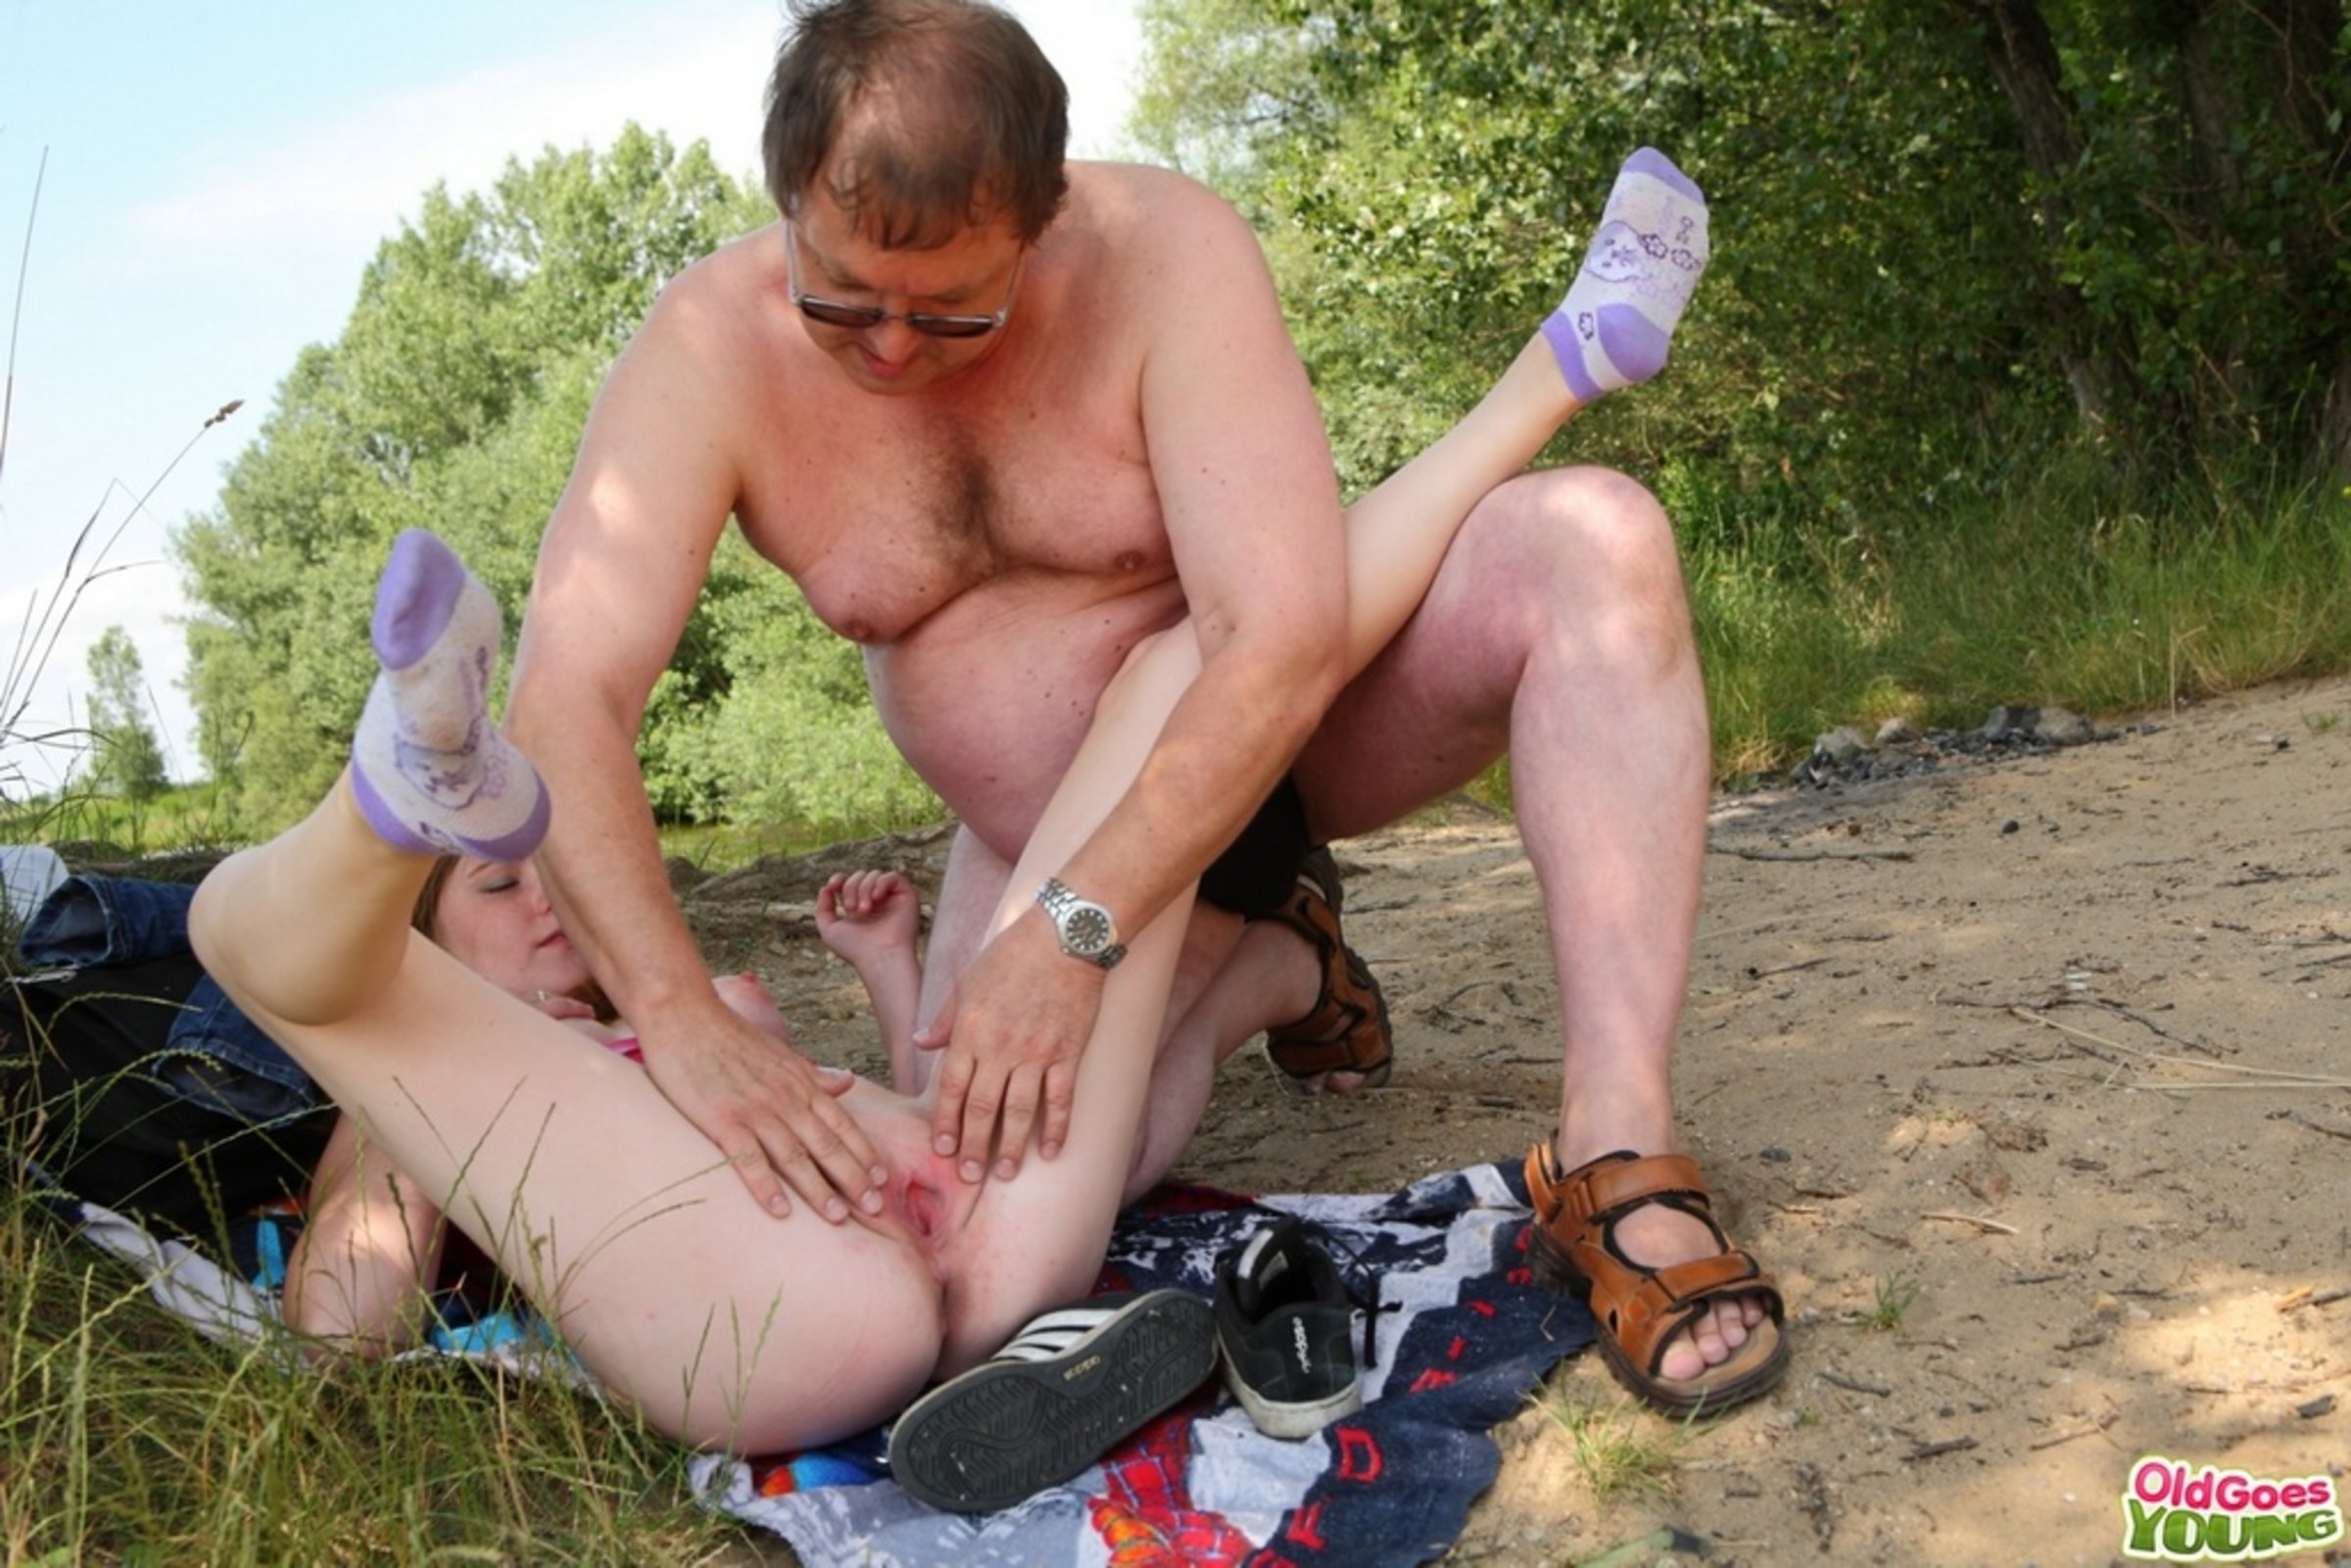 seks-s-bomzhom-na-ulitse-video-kucha-spermi-u-patsana